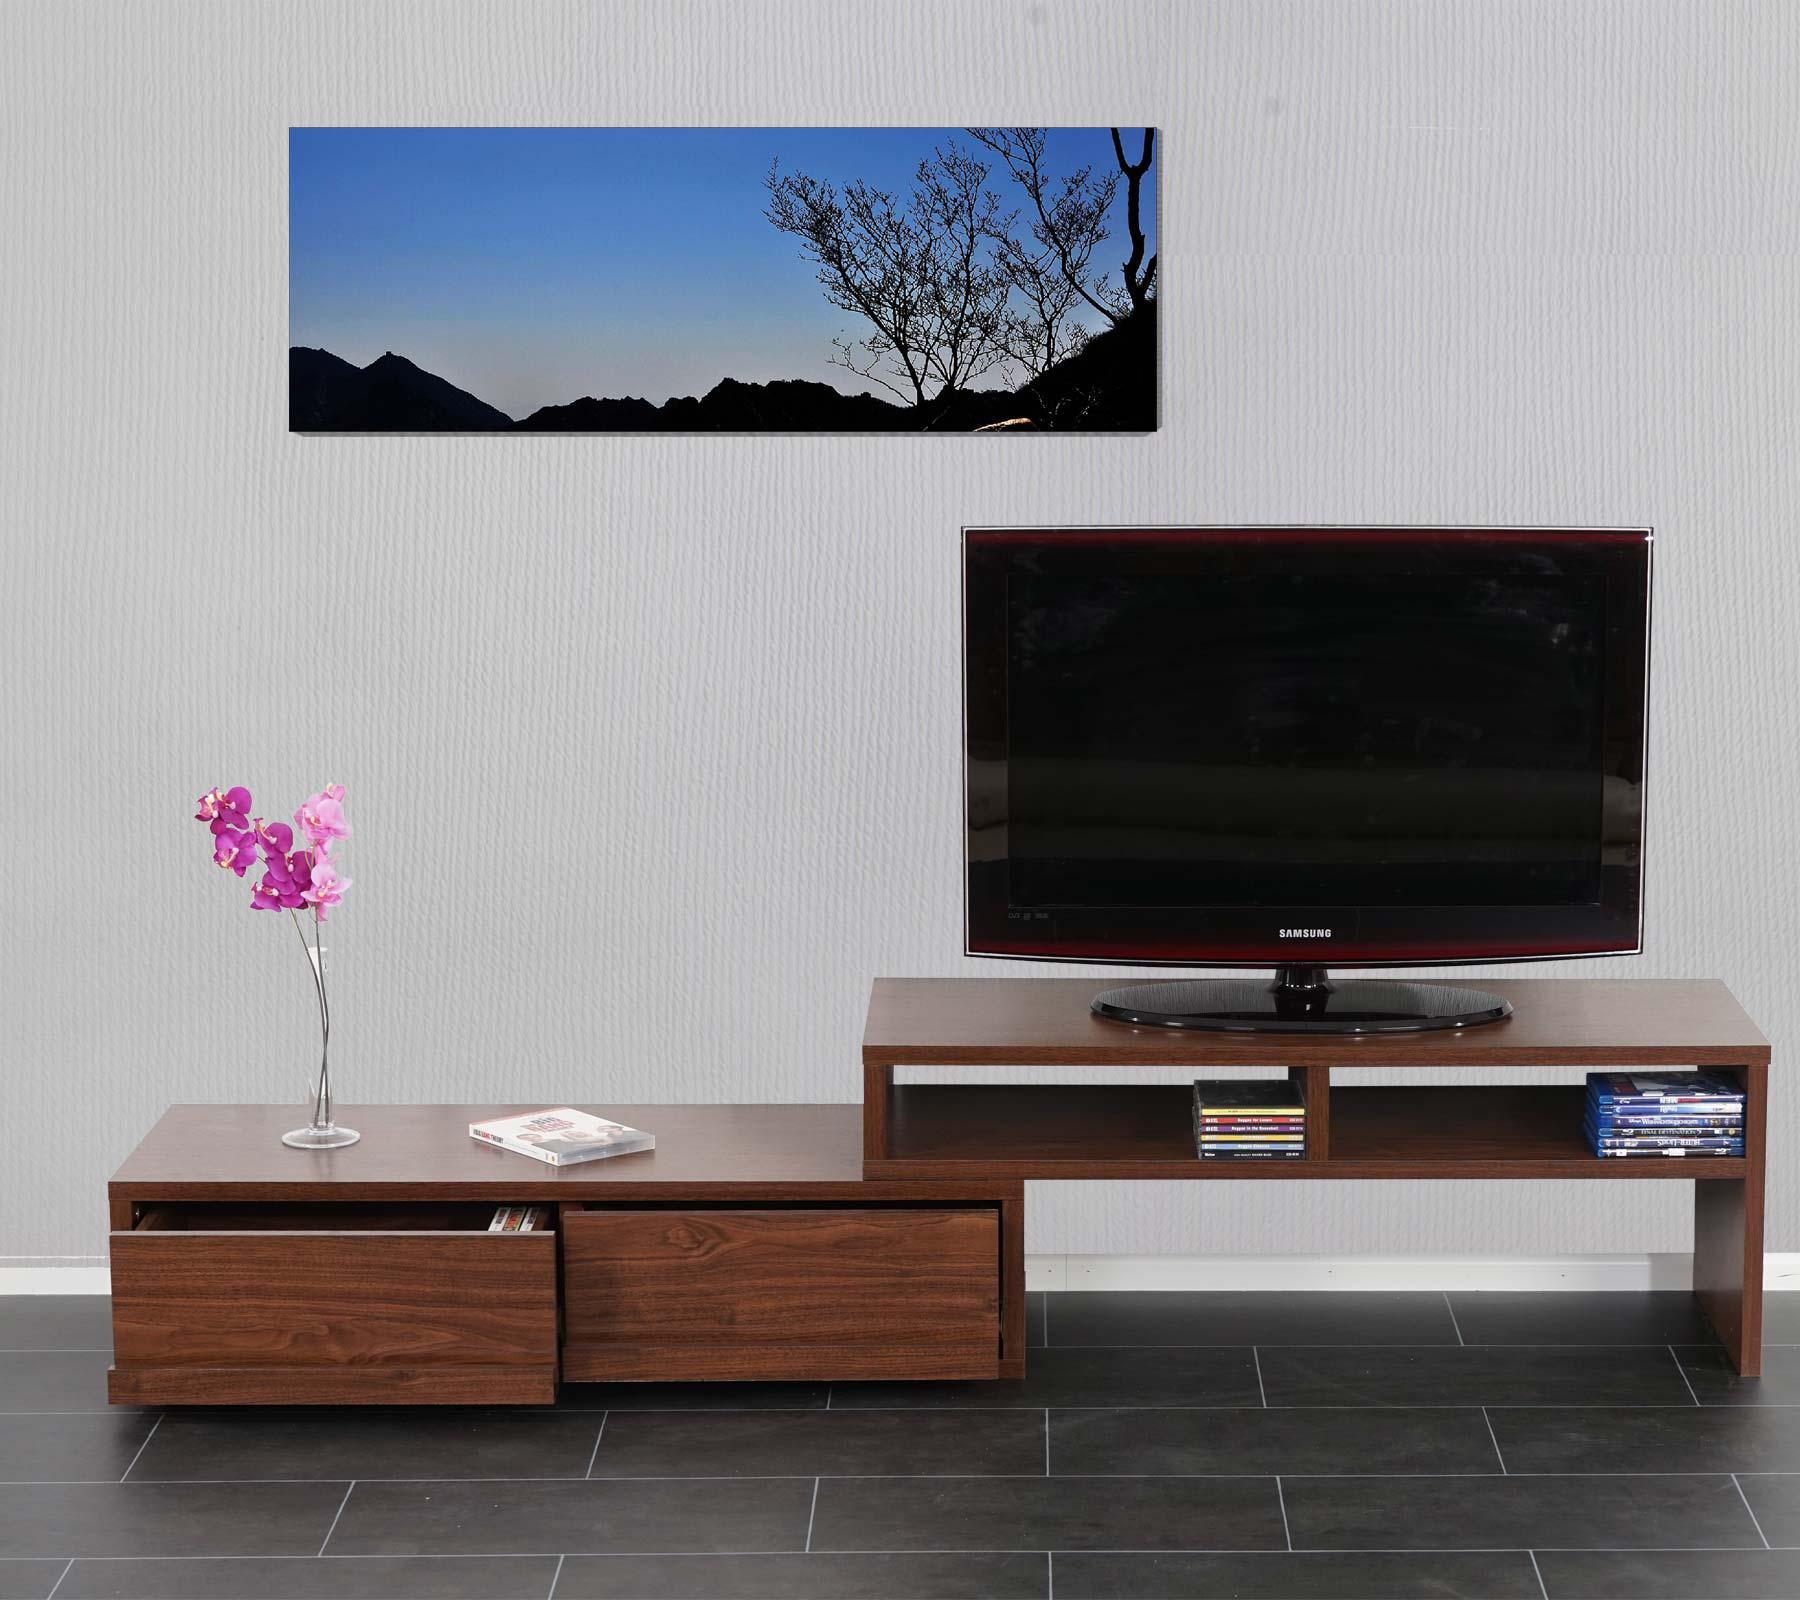 led bild mit beleuchtung wandbild kaufen bei mendler vertriebs gmbh. Black Bedroom Furniture Sets. Home Design Ideas